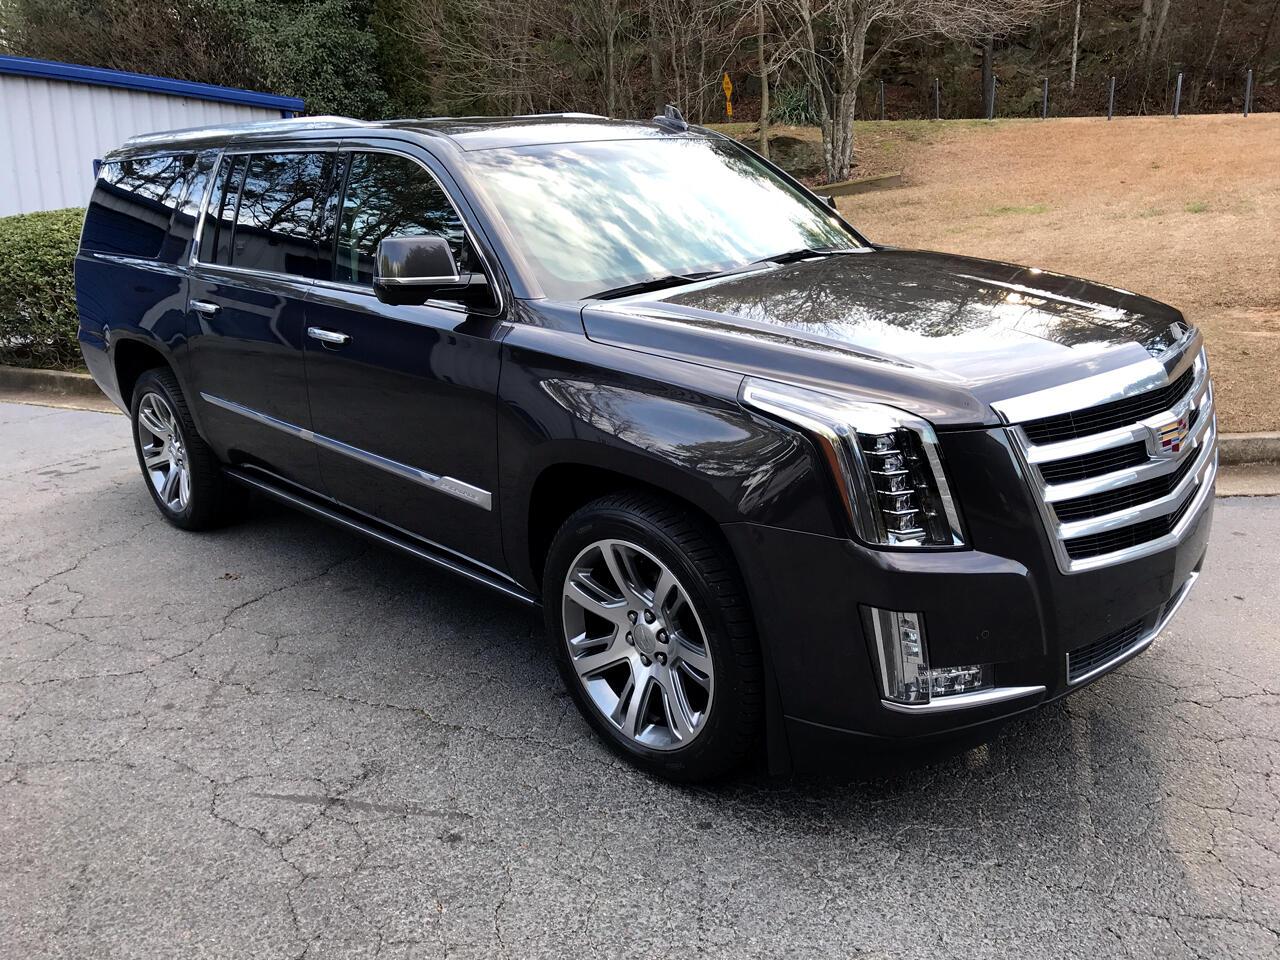 2015 Cadillac Escalade ESV 4WD 4dr Premium